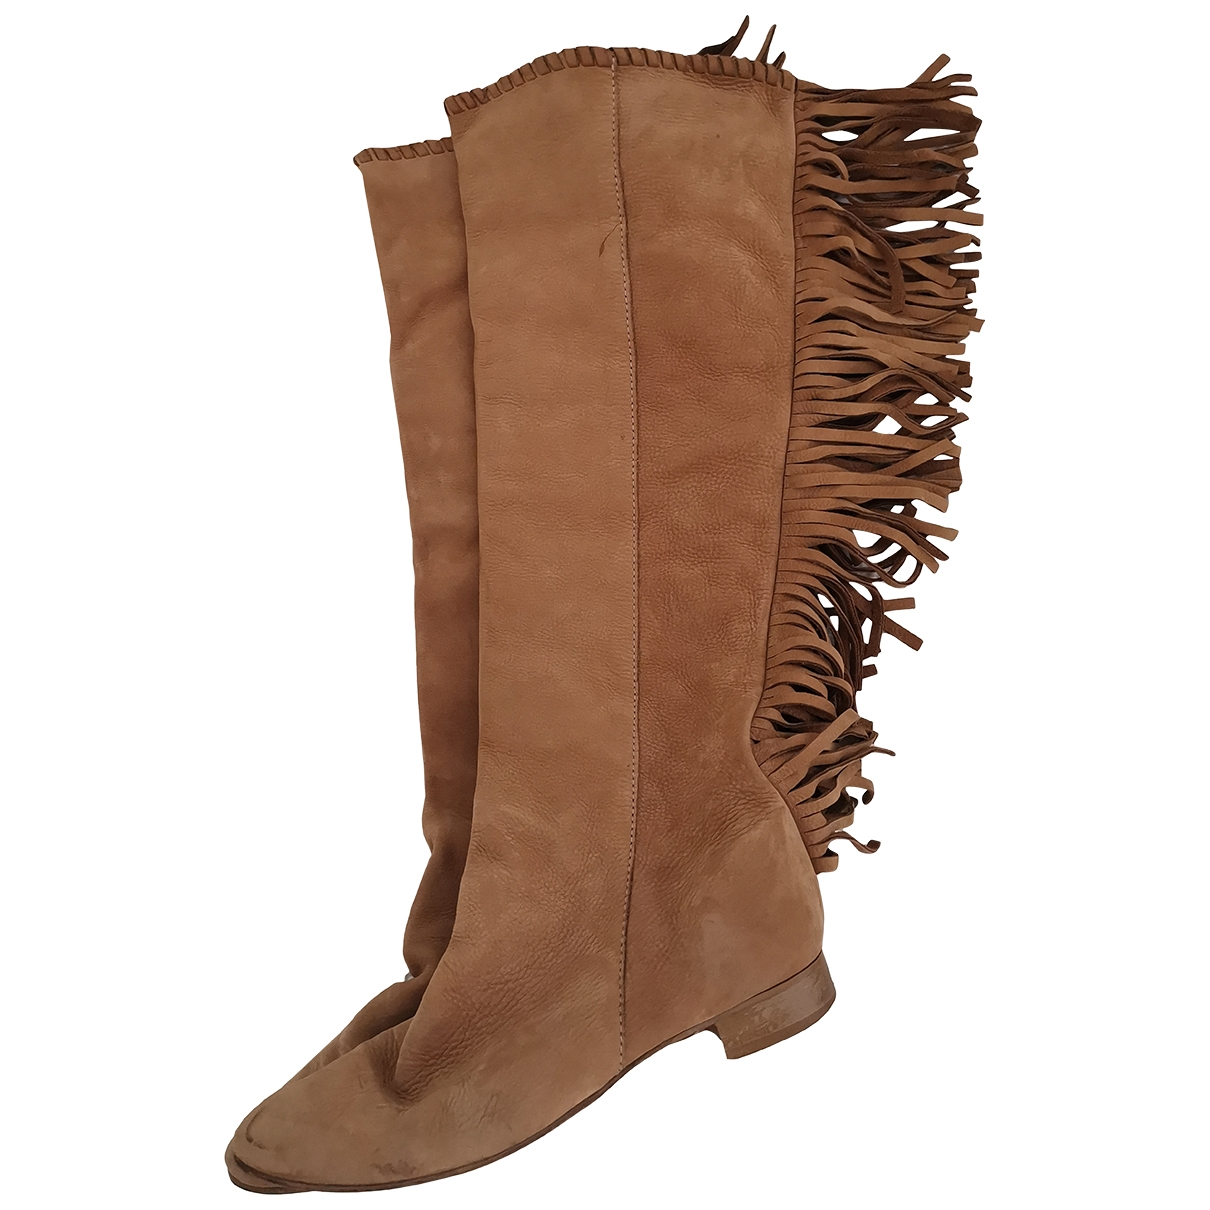 Zara \N Beige Suede Boots for Women 40 EU